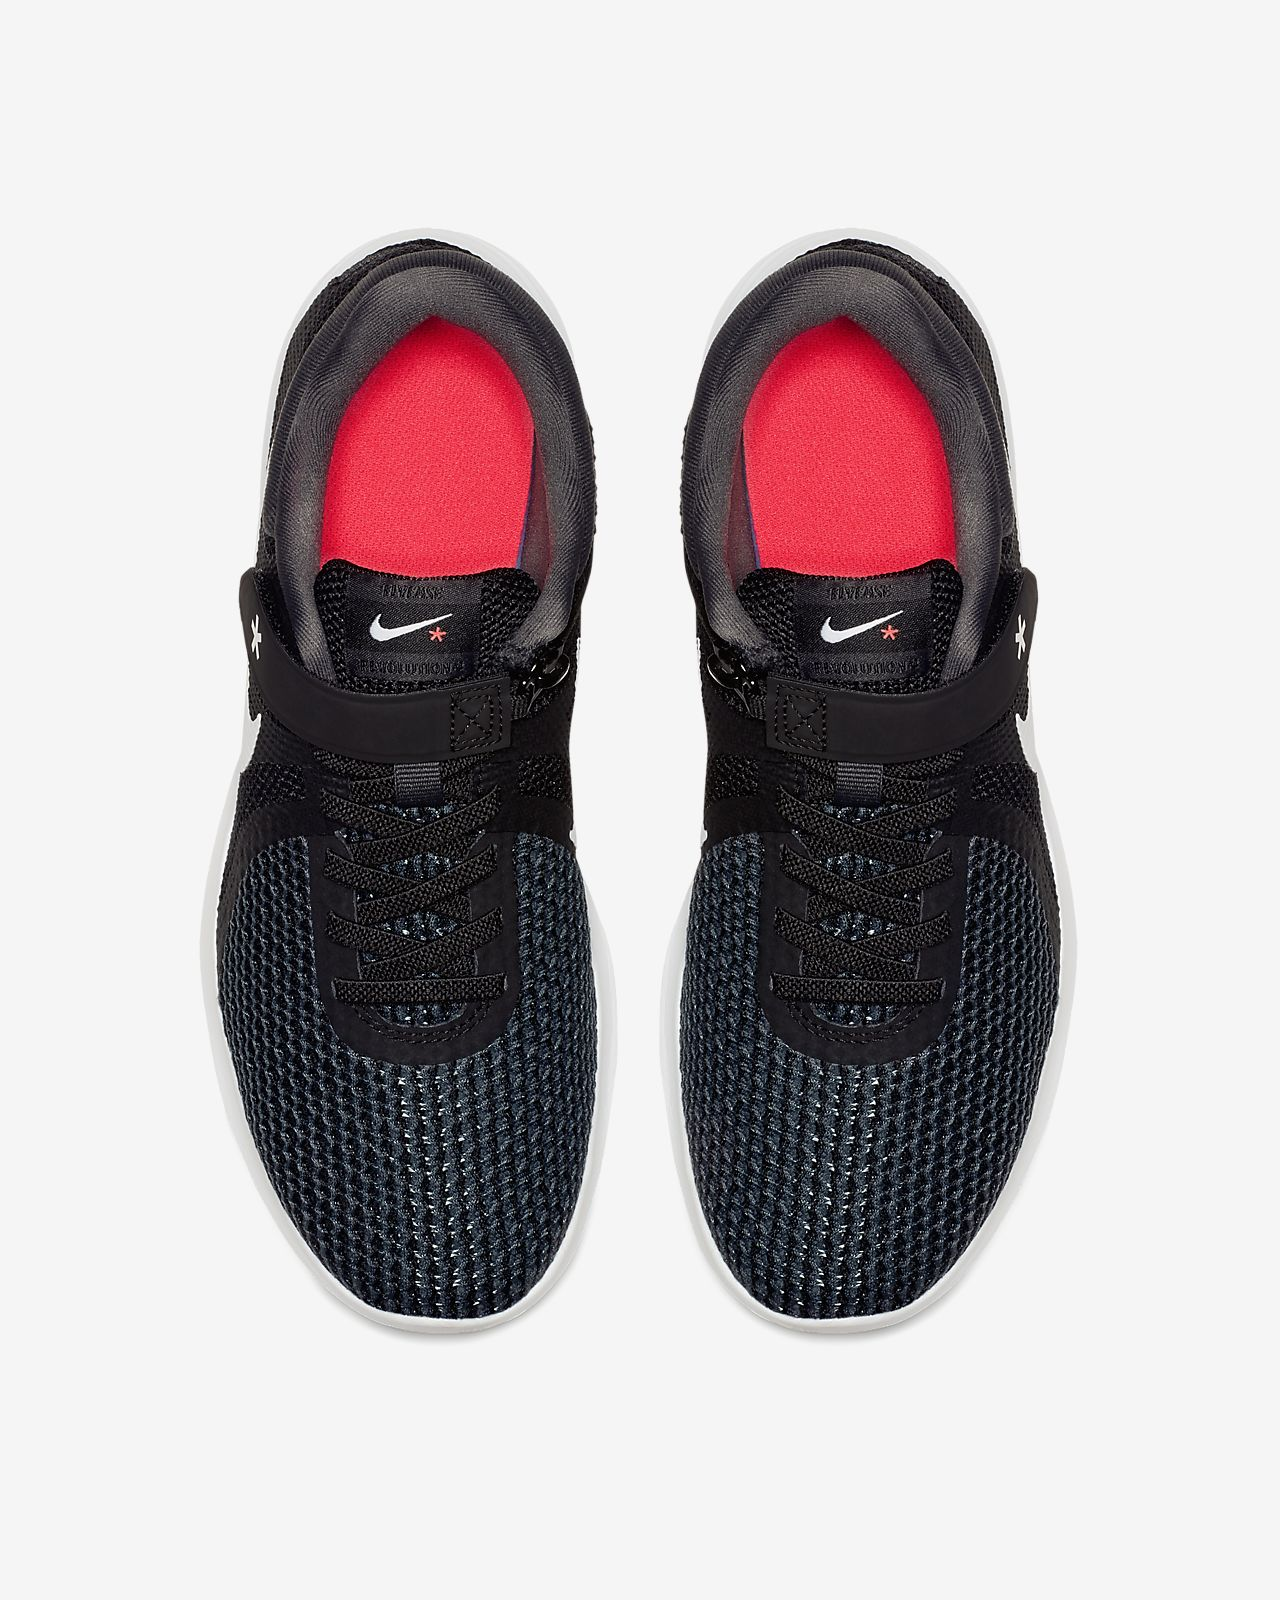 af572163c17 Nike Revolution 4 FlyEase Hardloopschoen voor dames. Nike.com BE